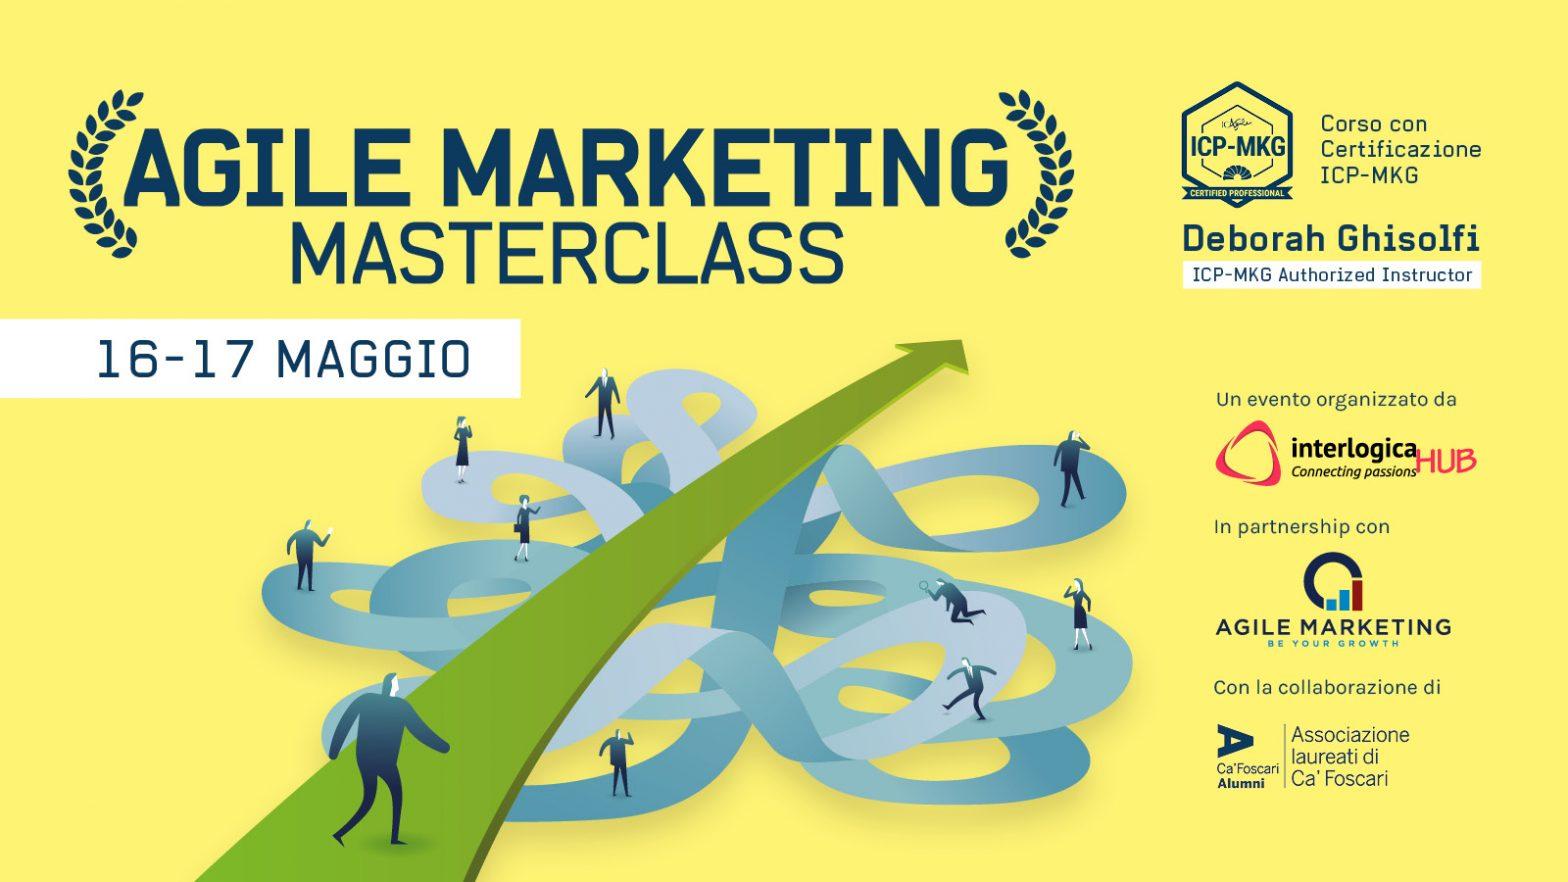 Agile Marketing Masterclass Cà Foscari